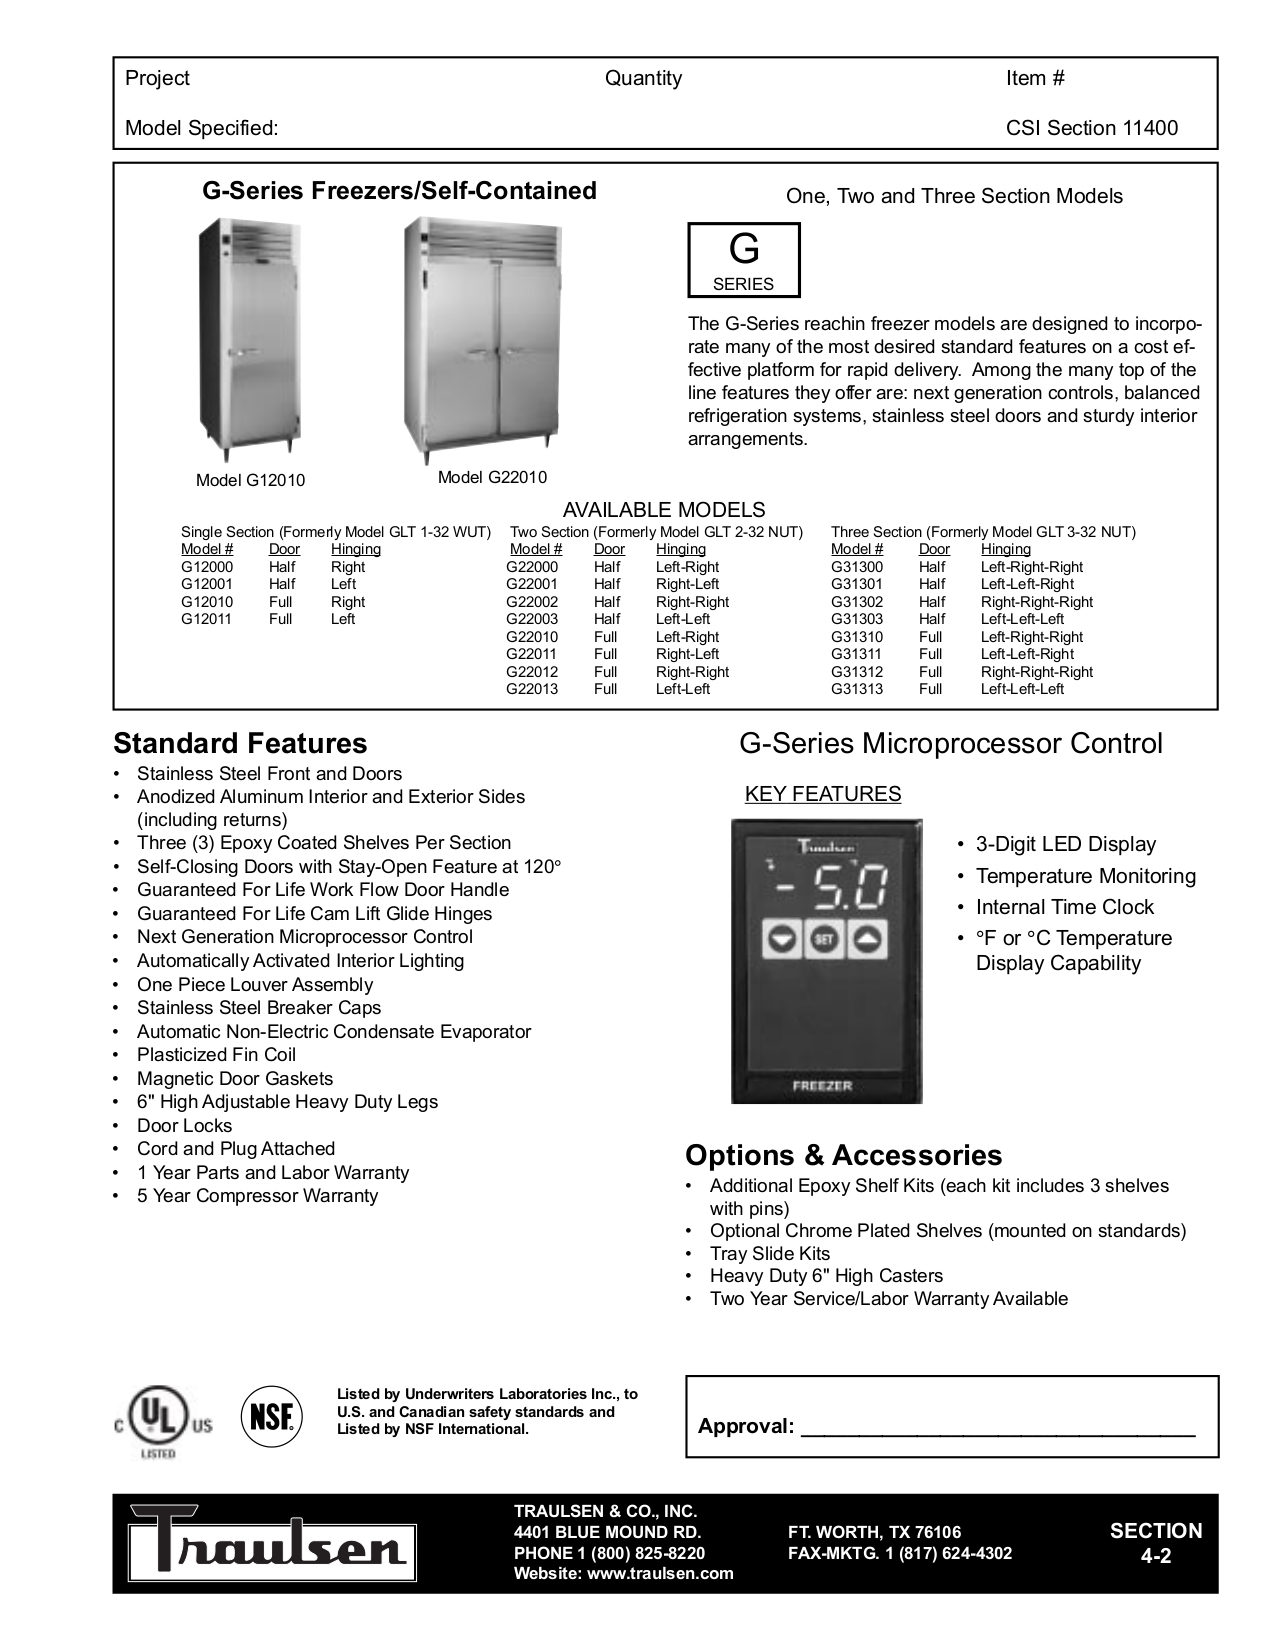 Traulsen g12011 wiring diagram wiring diagram virtual fretboard free pdf for traulsen g12011 freezer manual asfbconference2016 Gallery